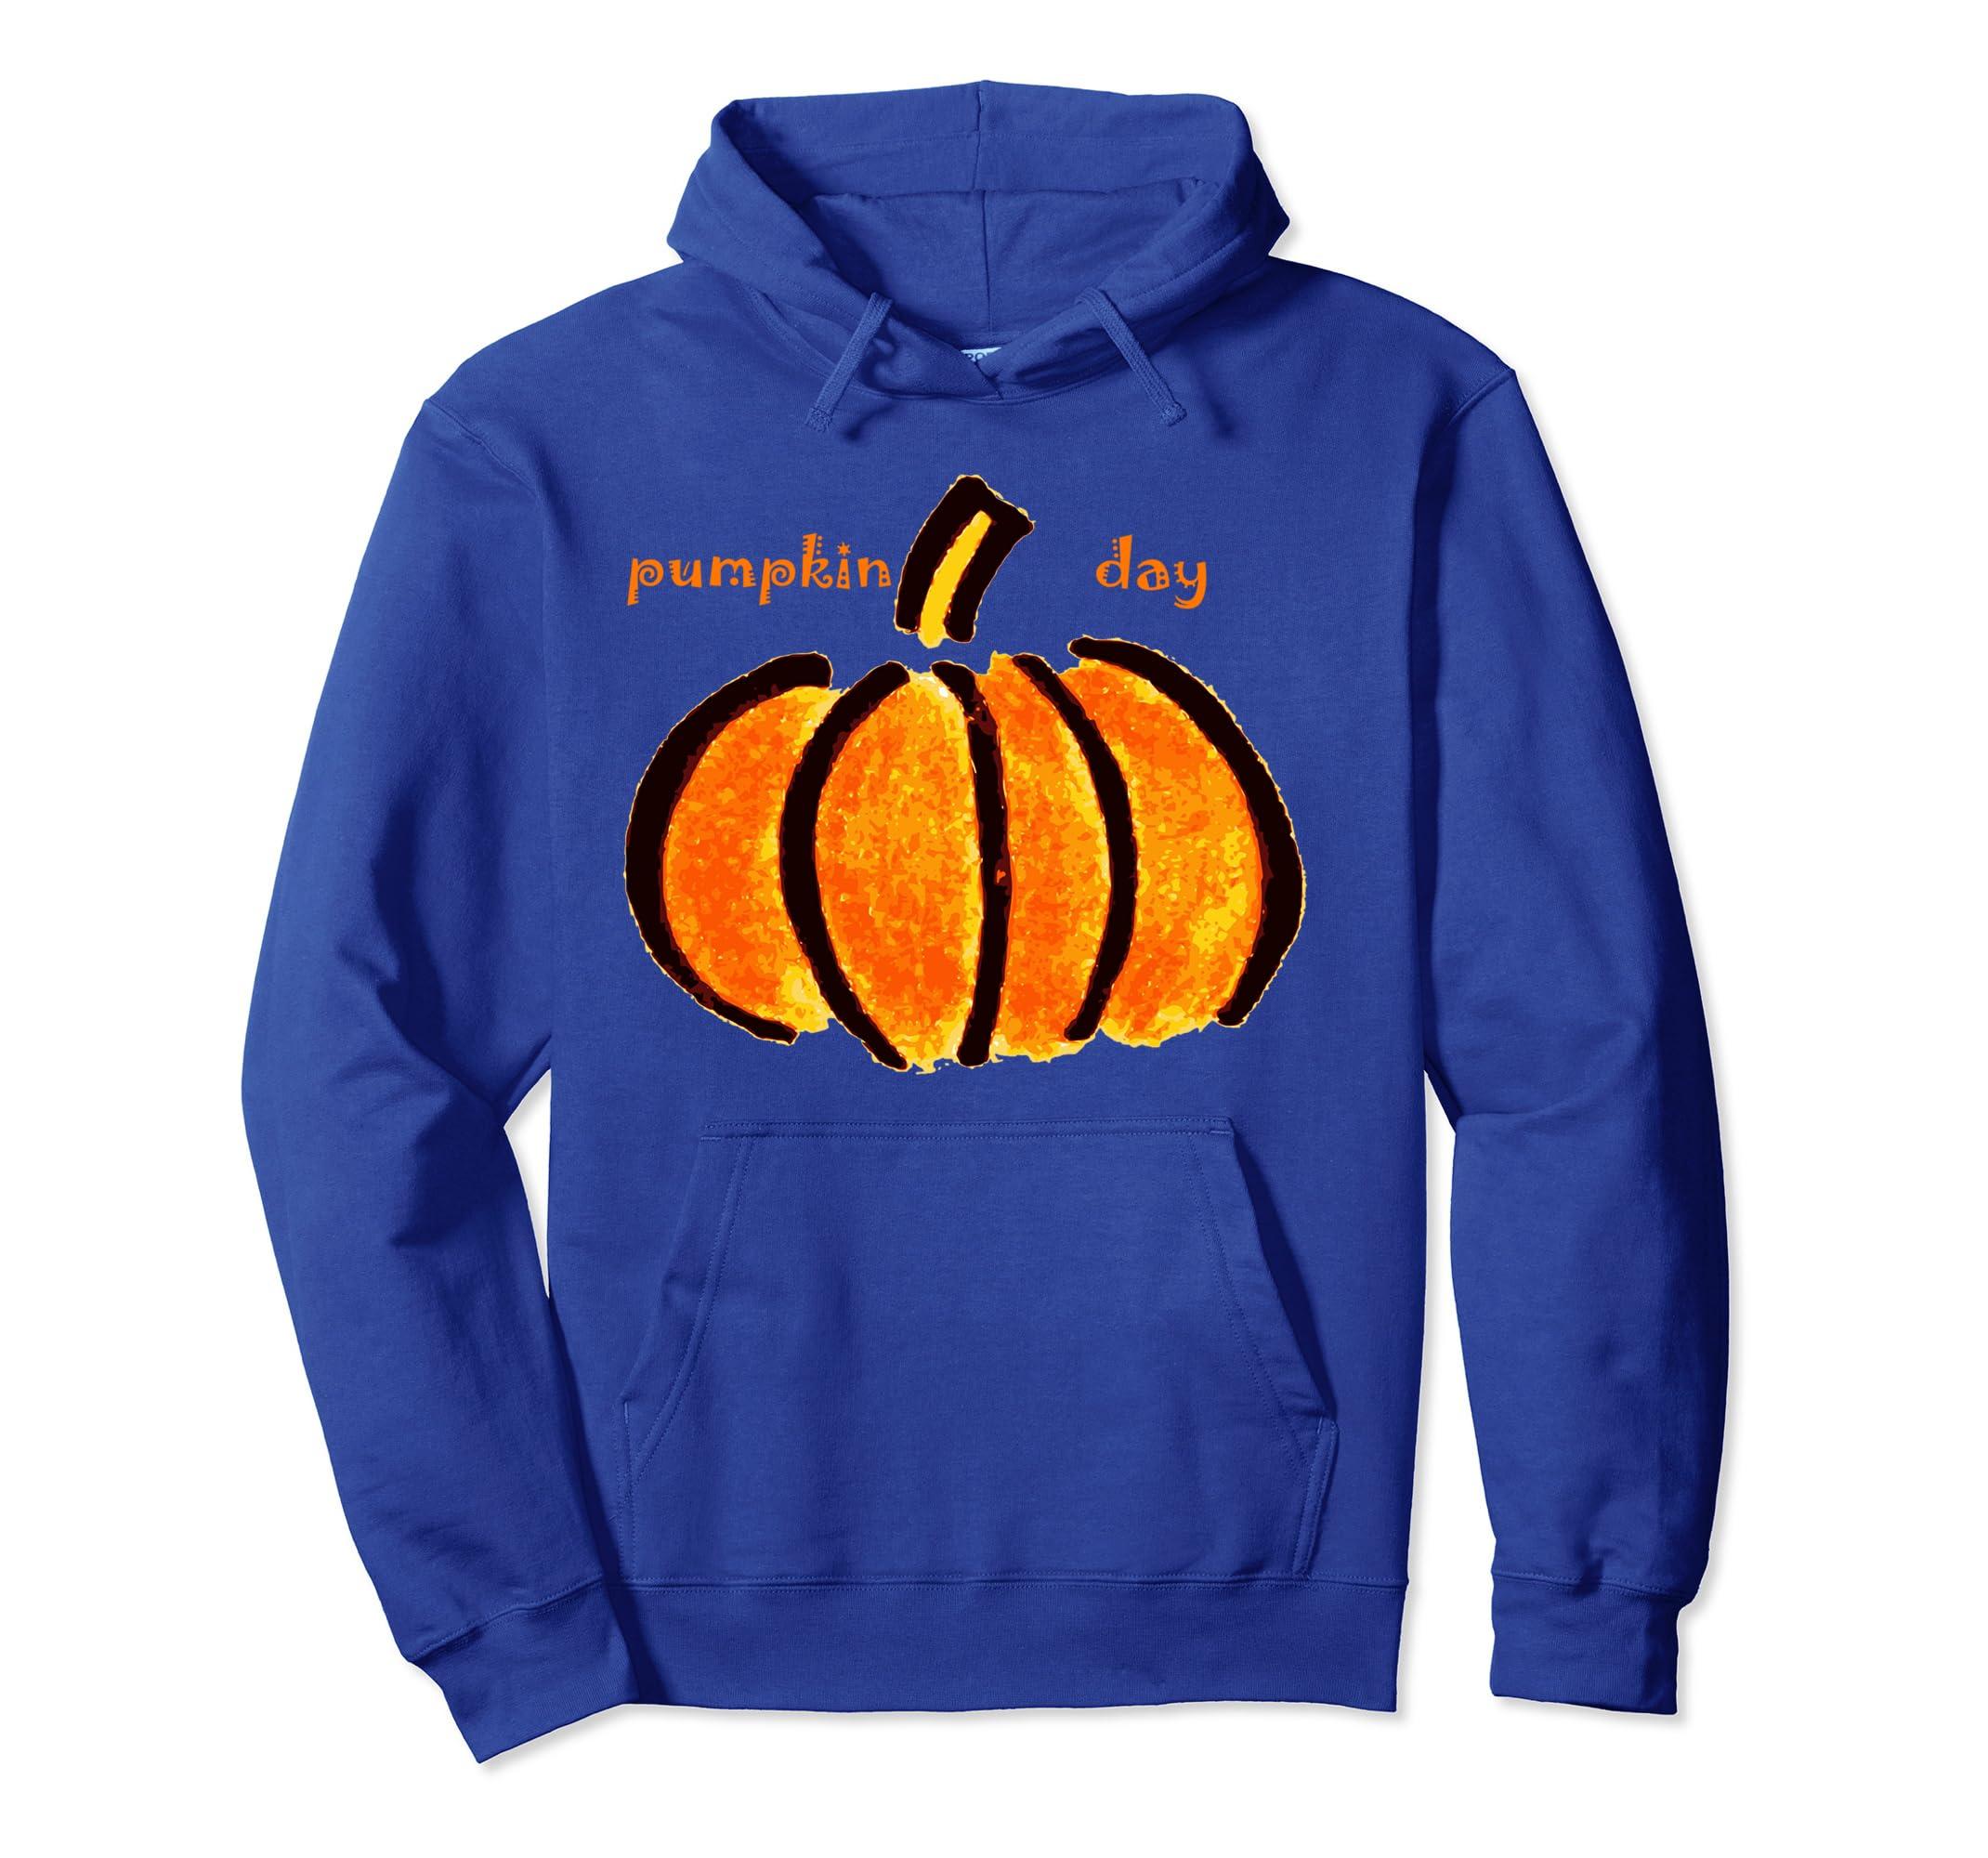 Pumpkin Autumn Halloween hoodie pullover men, women, kids- TPT